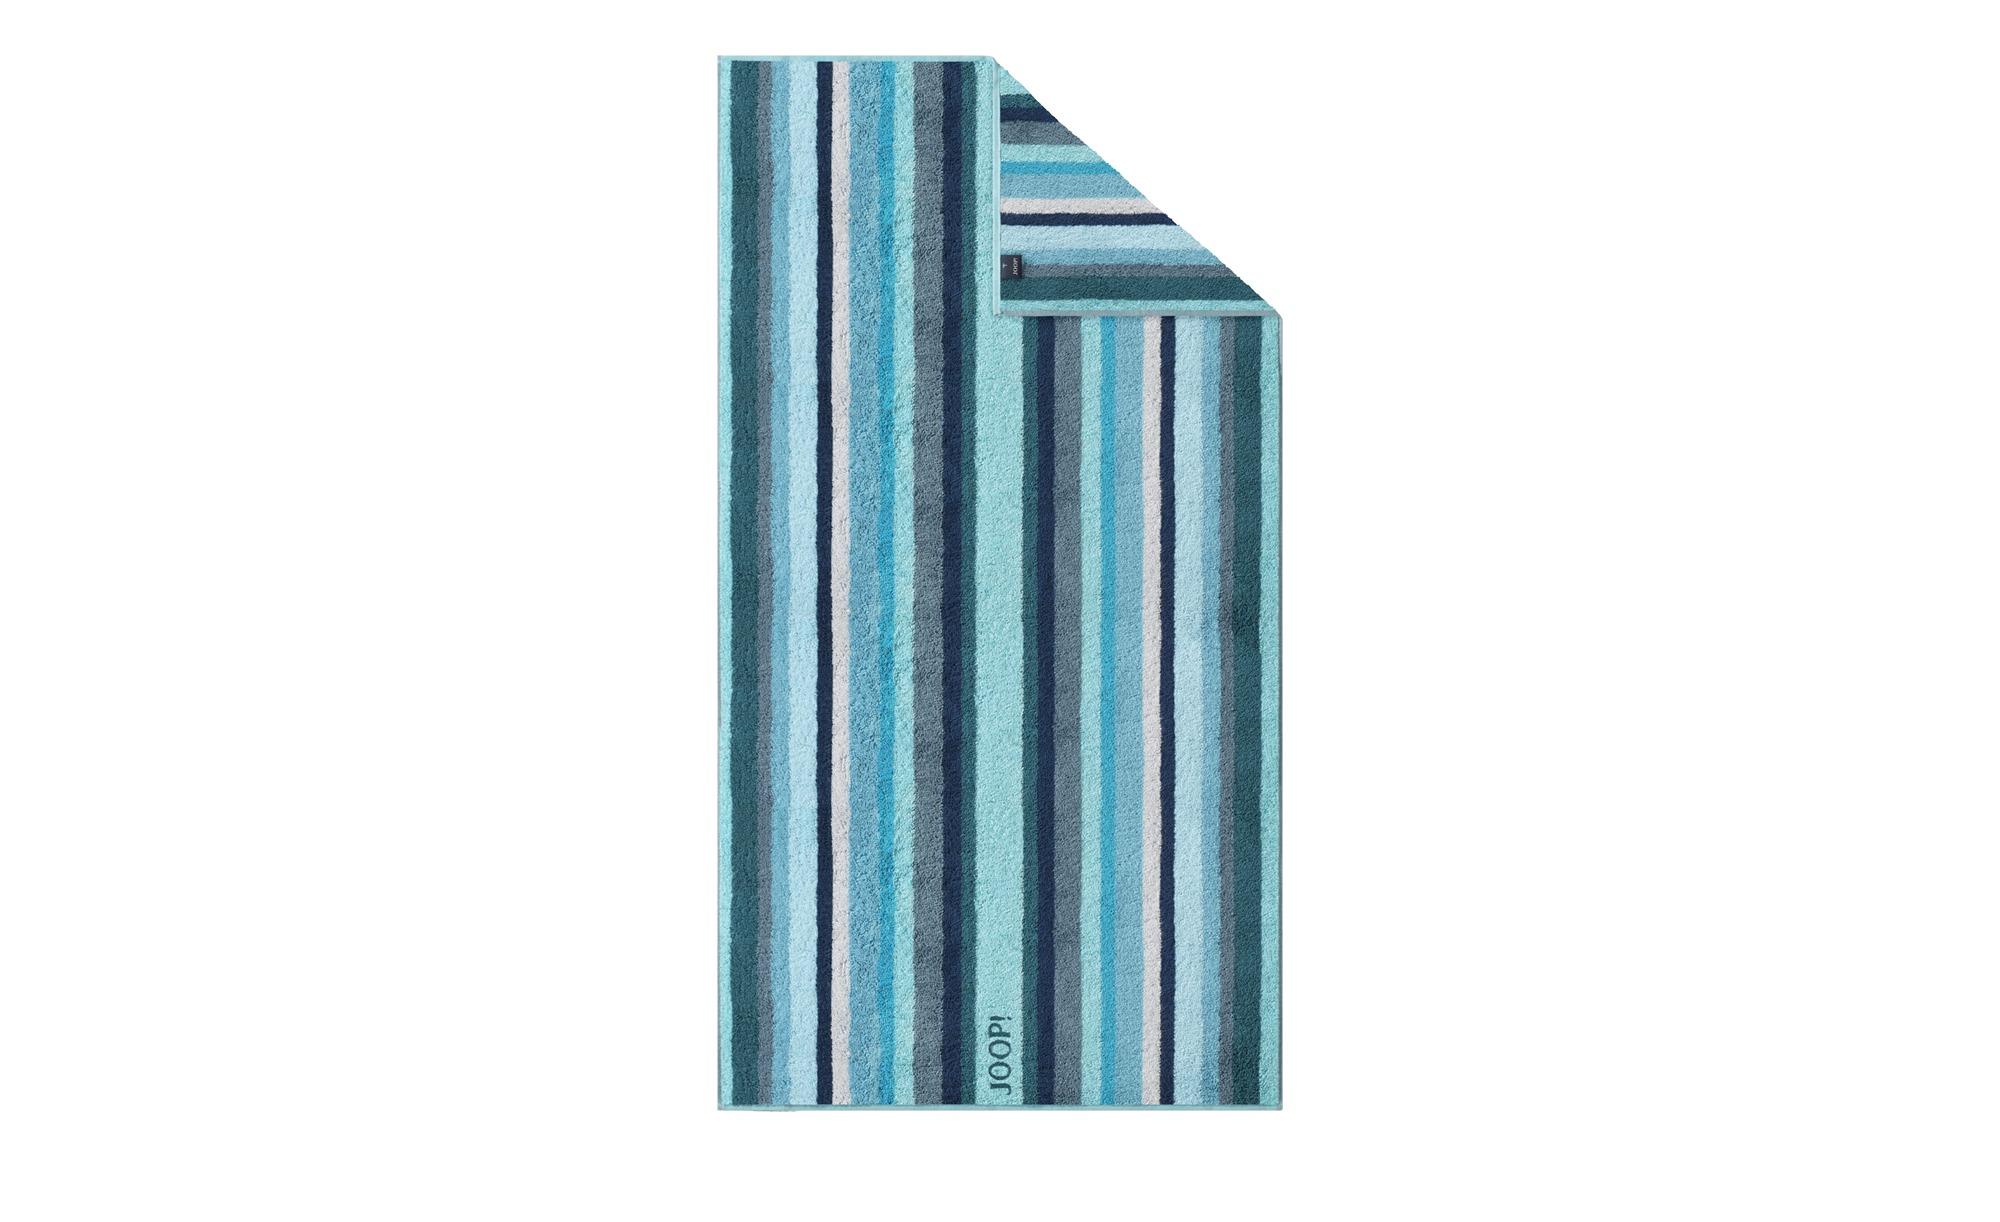 JOOP! Duschtuch  JOOP 1664 Stripes ¦ grün ¦ 100% Baumwolle  ¦ Maße (cm): B: 80 Badtextilien und Zubehör > Handtücher & Badetücher > Duschtücher - Höffner